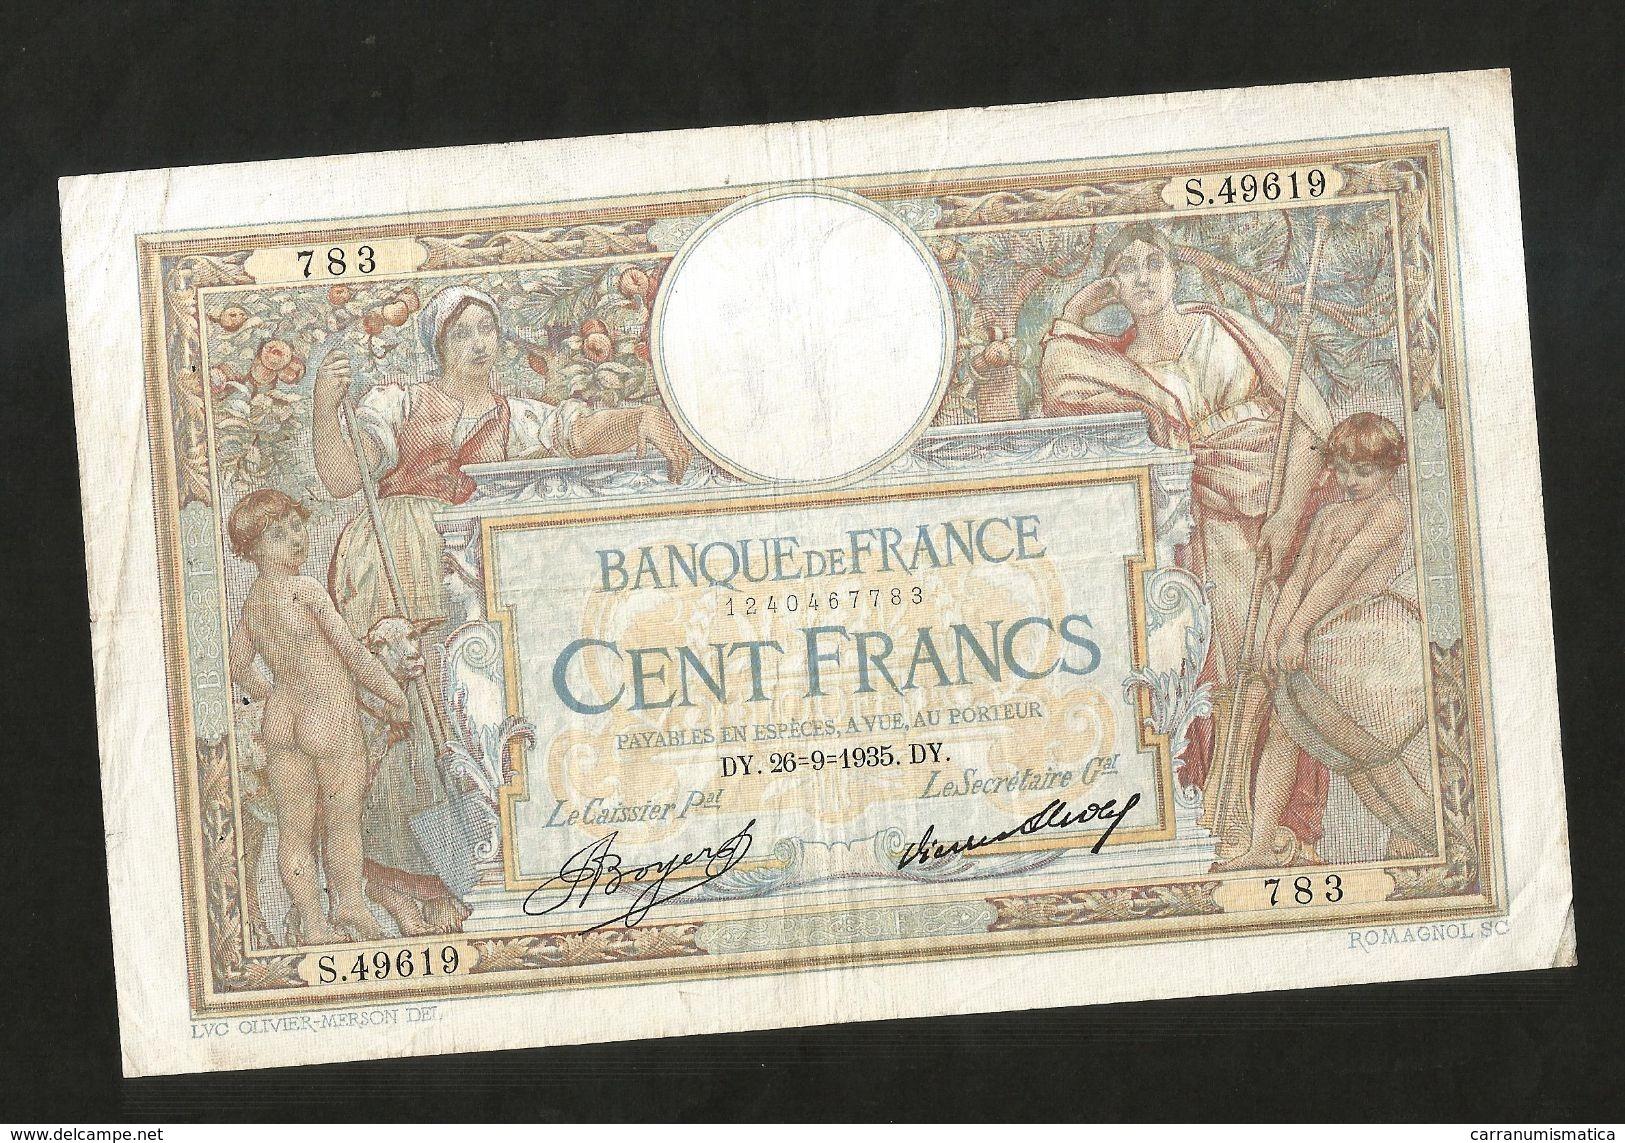 FRANCE - BANQUE De FRANCE - 100 FRANCS  (DY. 26 - 9 - 1935)  LUC OLIVER MERSON - 100 F 1908-1939 ''Luc Olivier Merson''